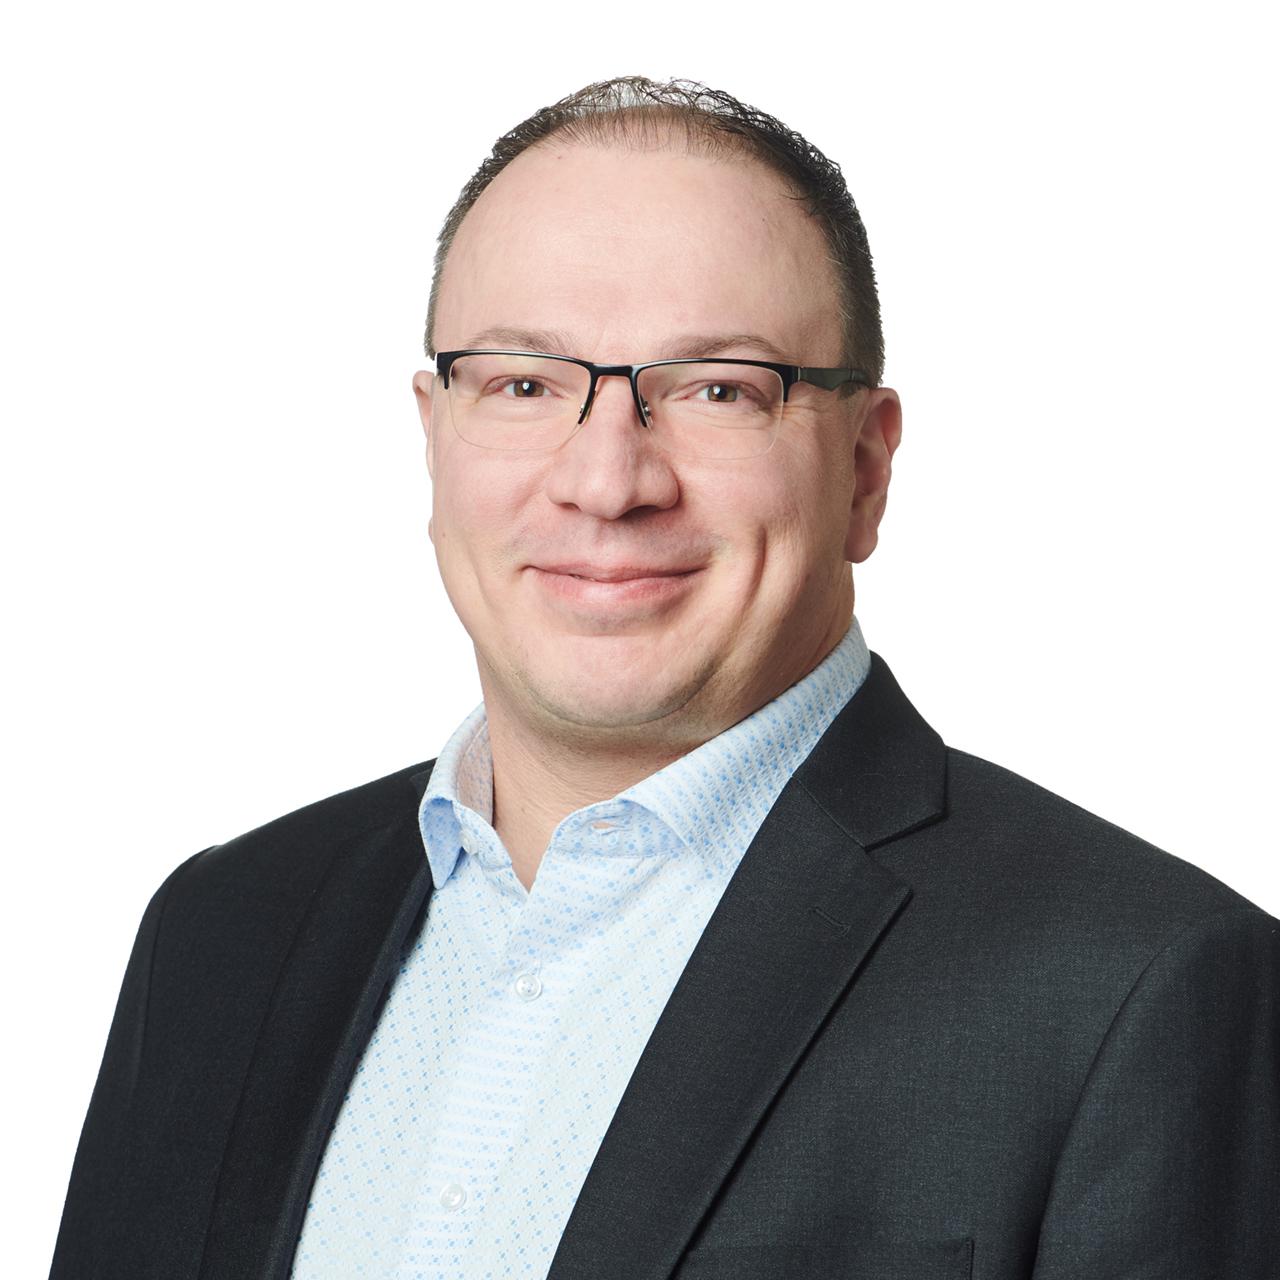 Klaus Lakkala